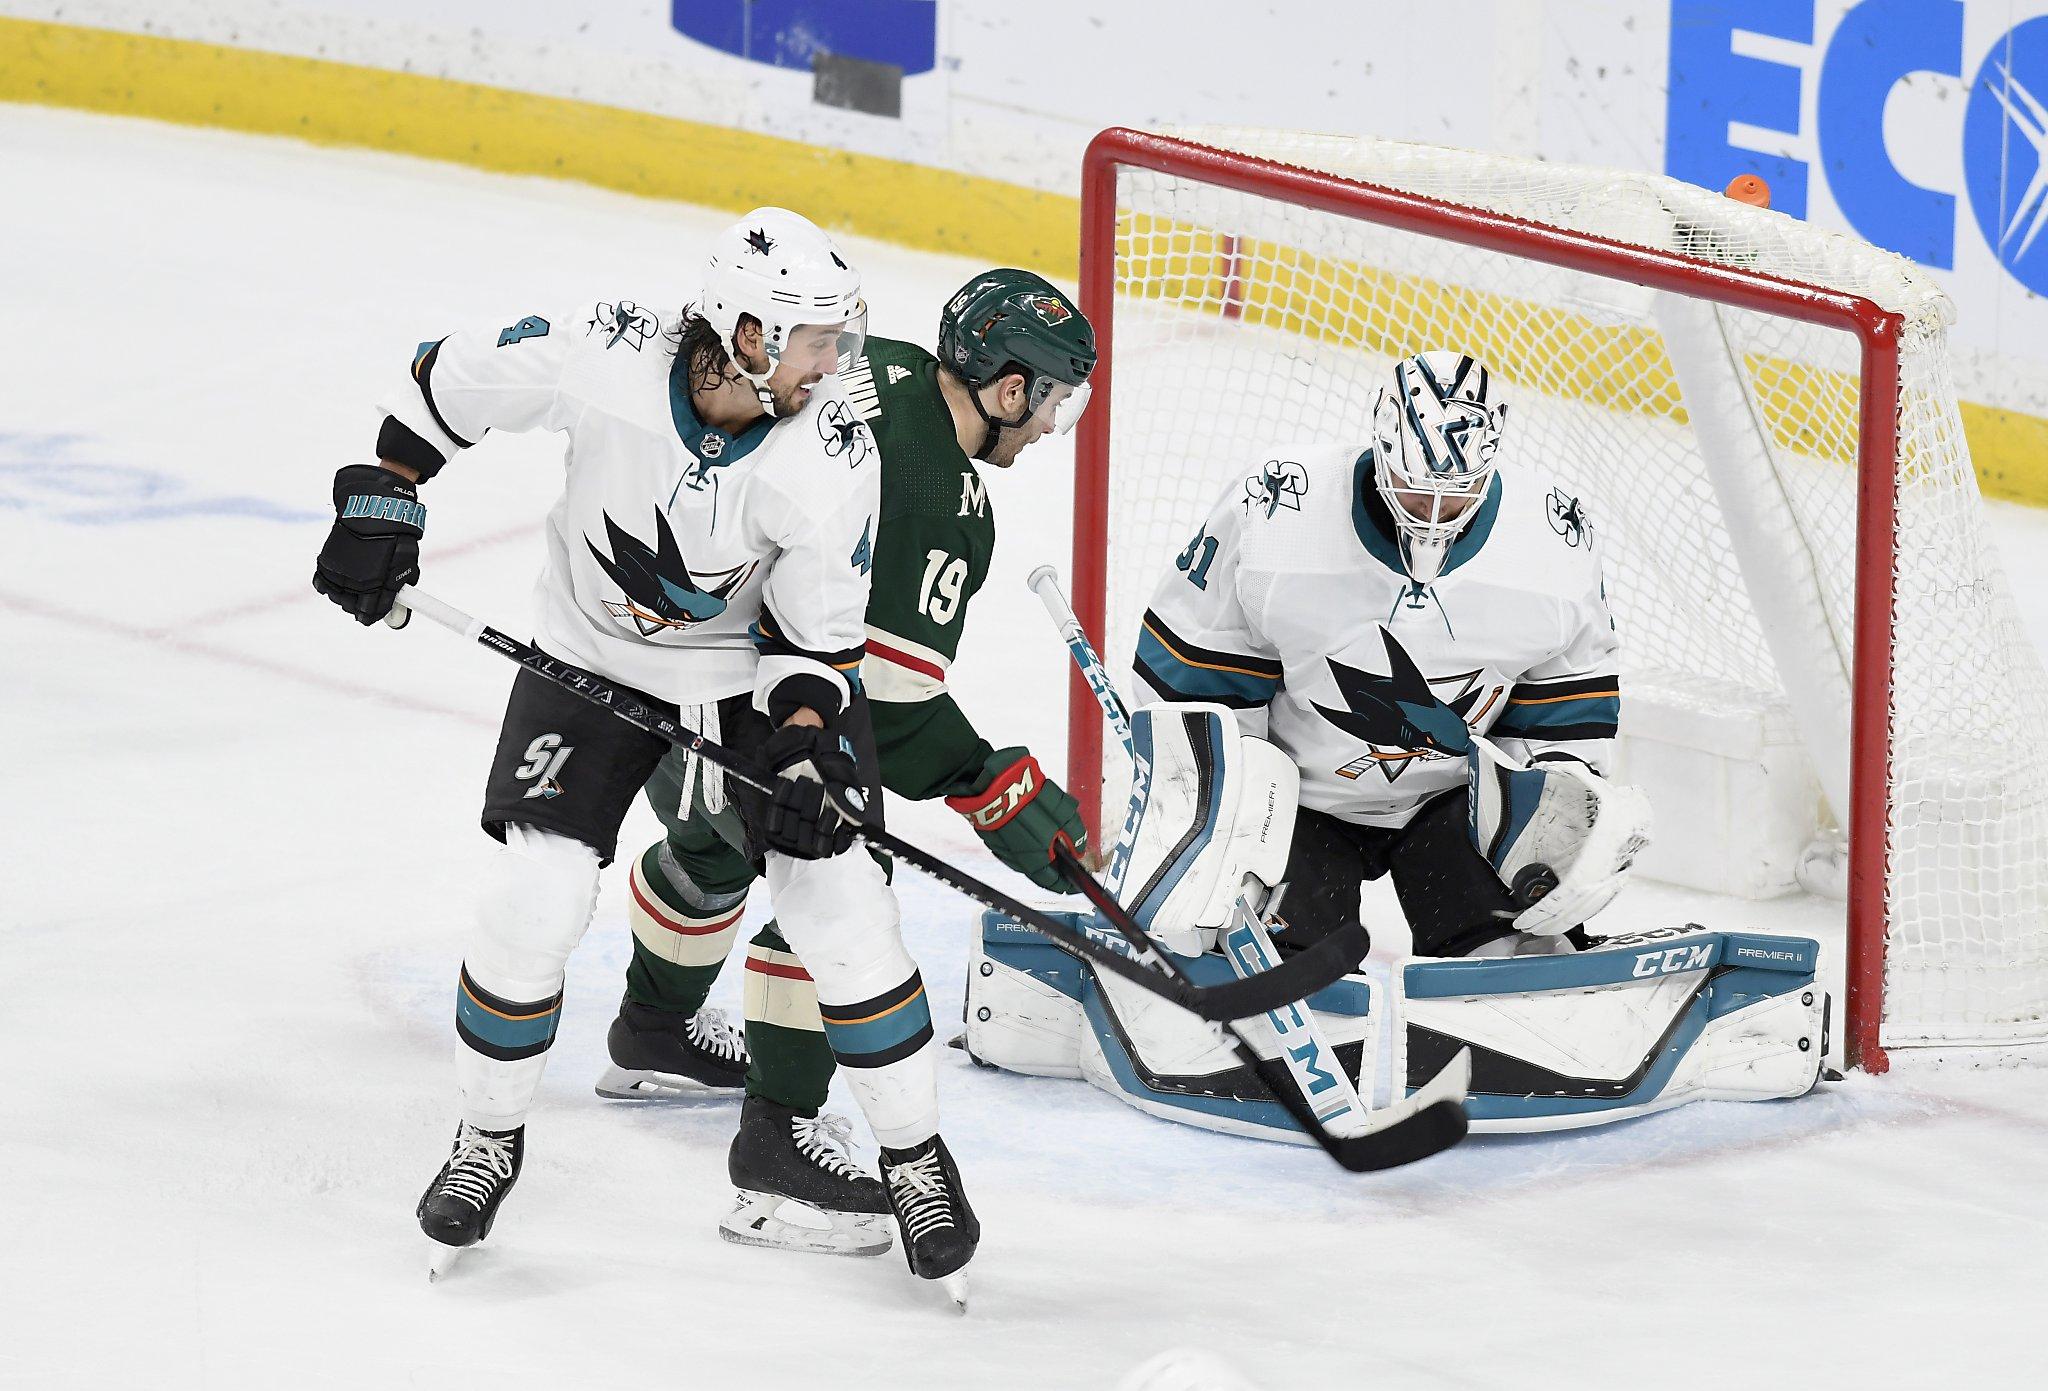 Sharks defenseman Erik Karlsson out for season with broken thumb